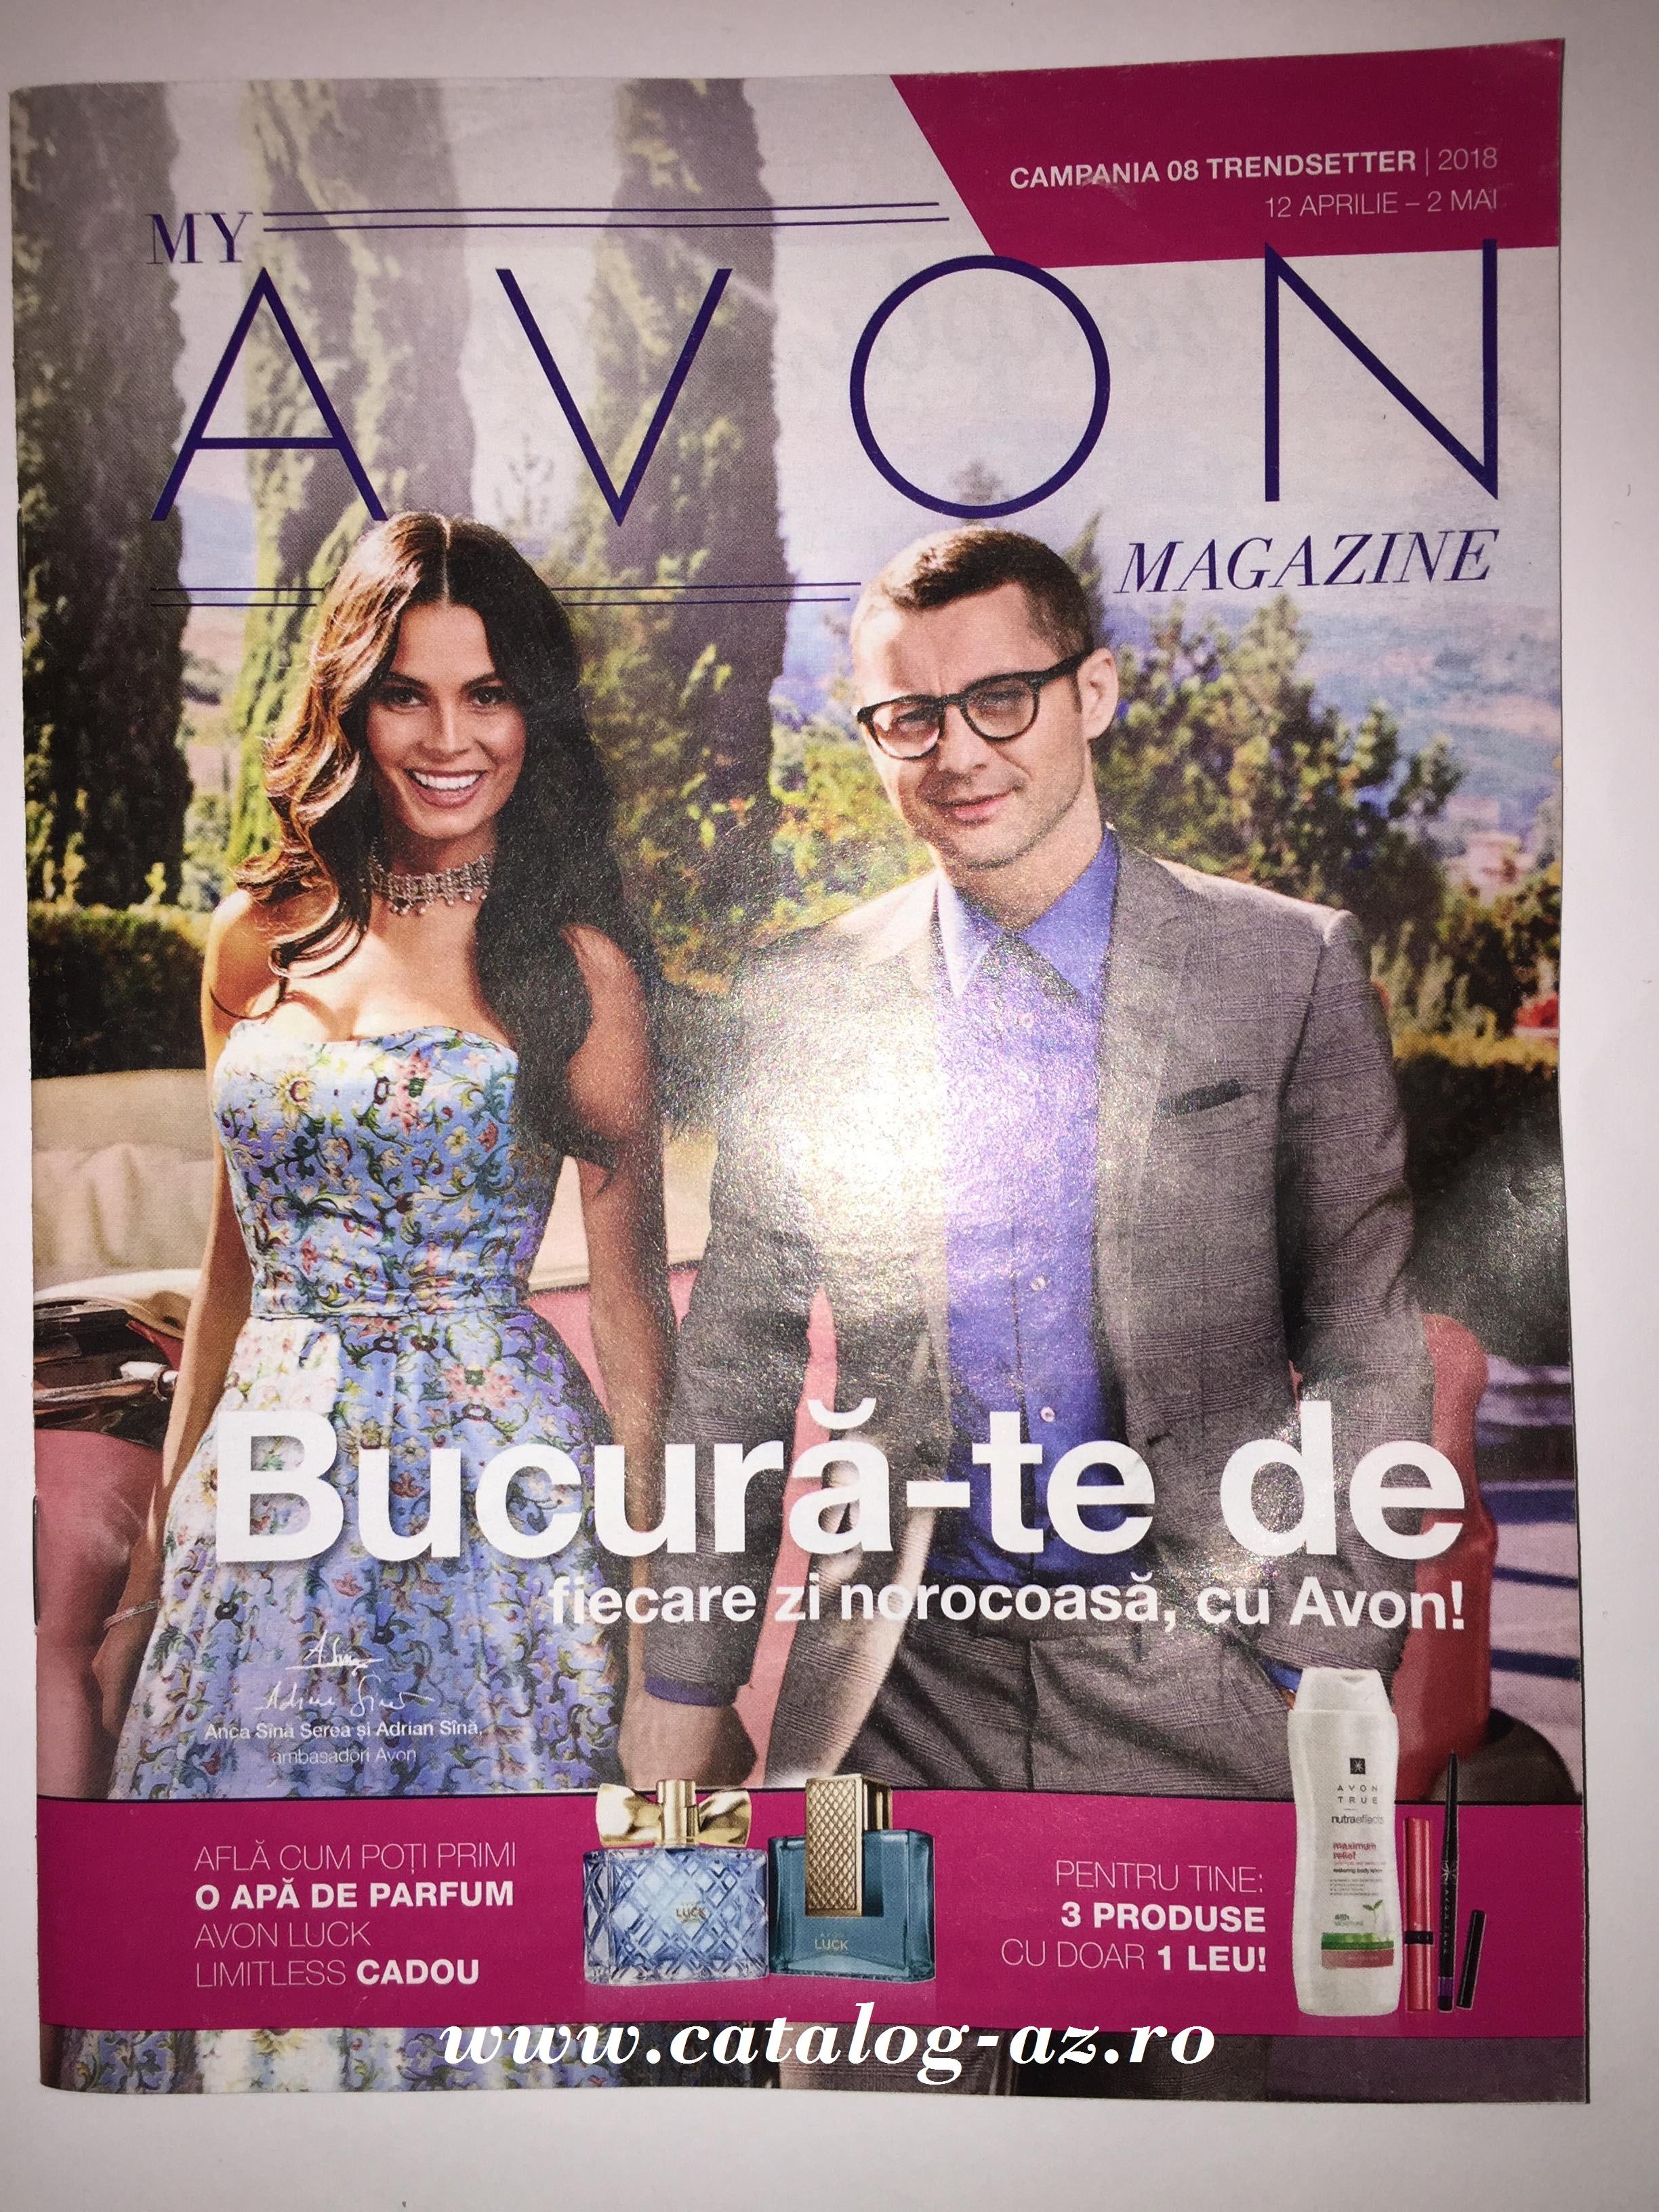 My avon magazine c8 2020